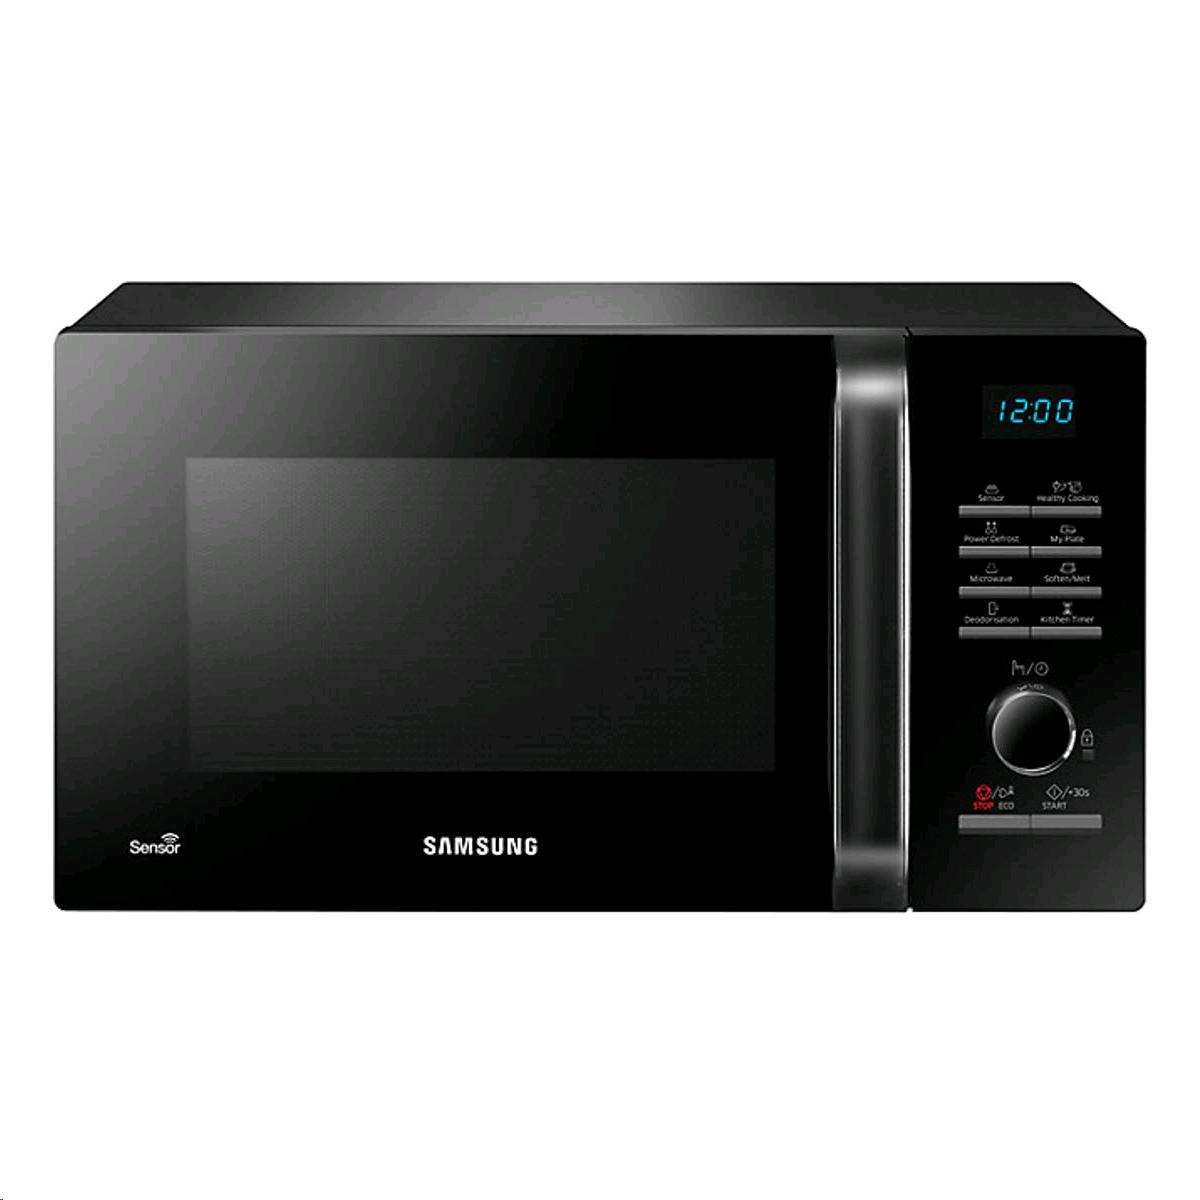 Samsung Solo Sensor Microwave 23lts 800w